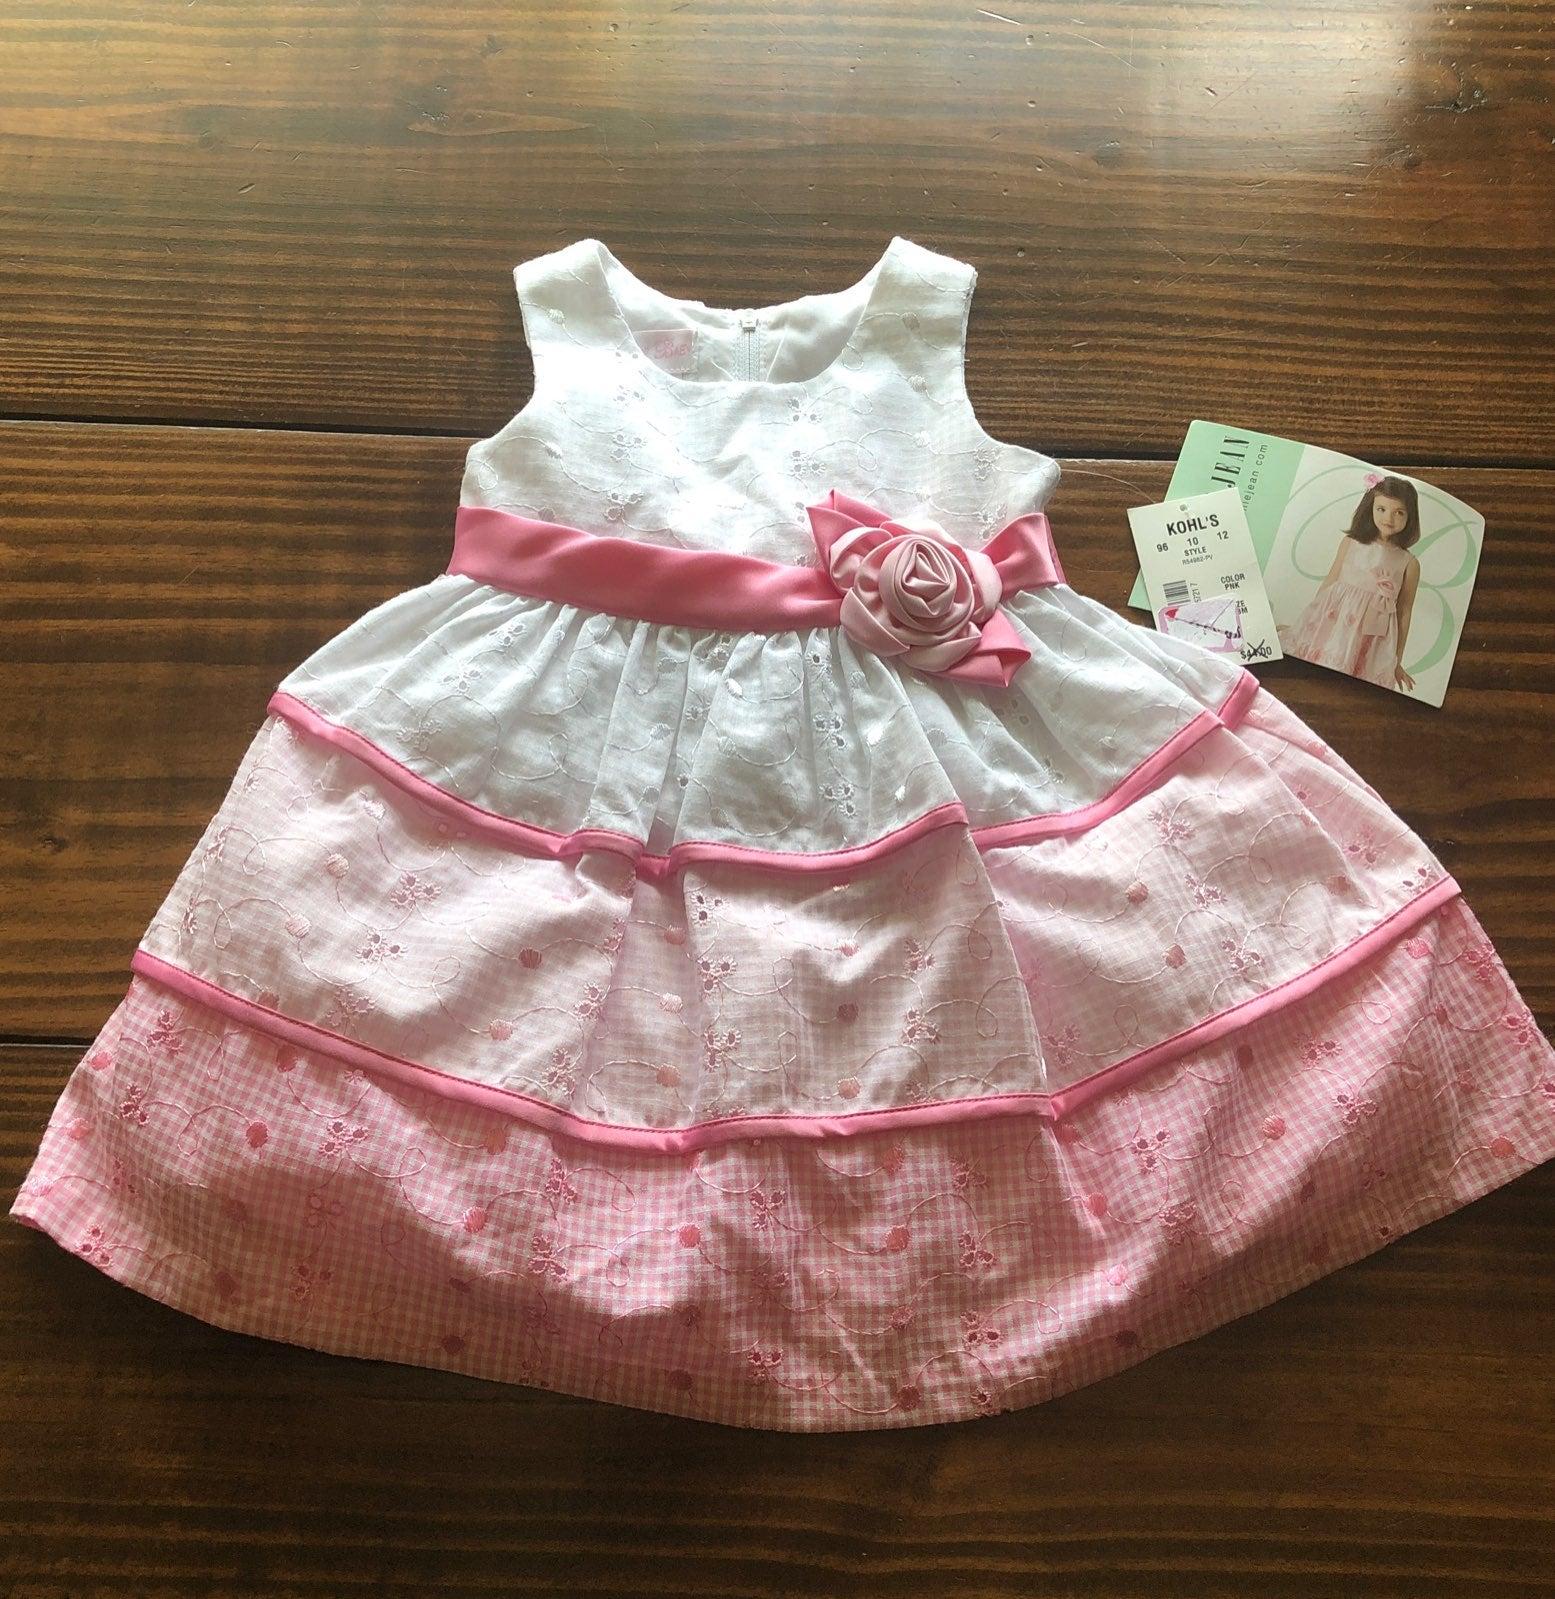 Bonnie Baby 18M Pink Formal Dress